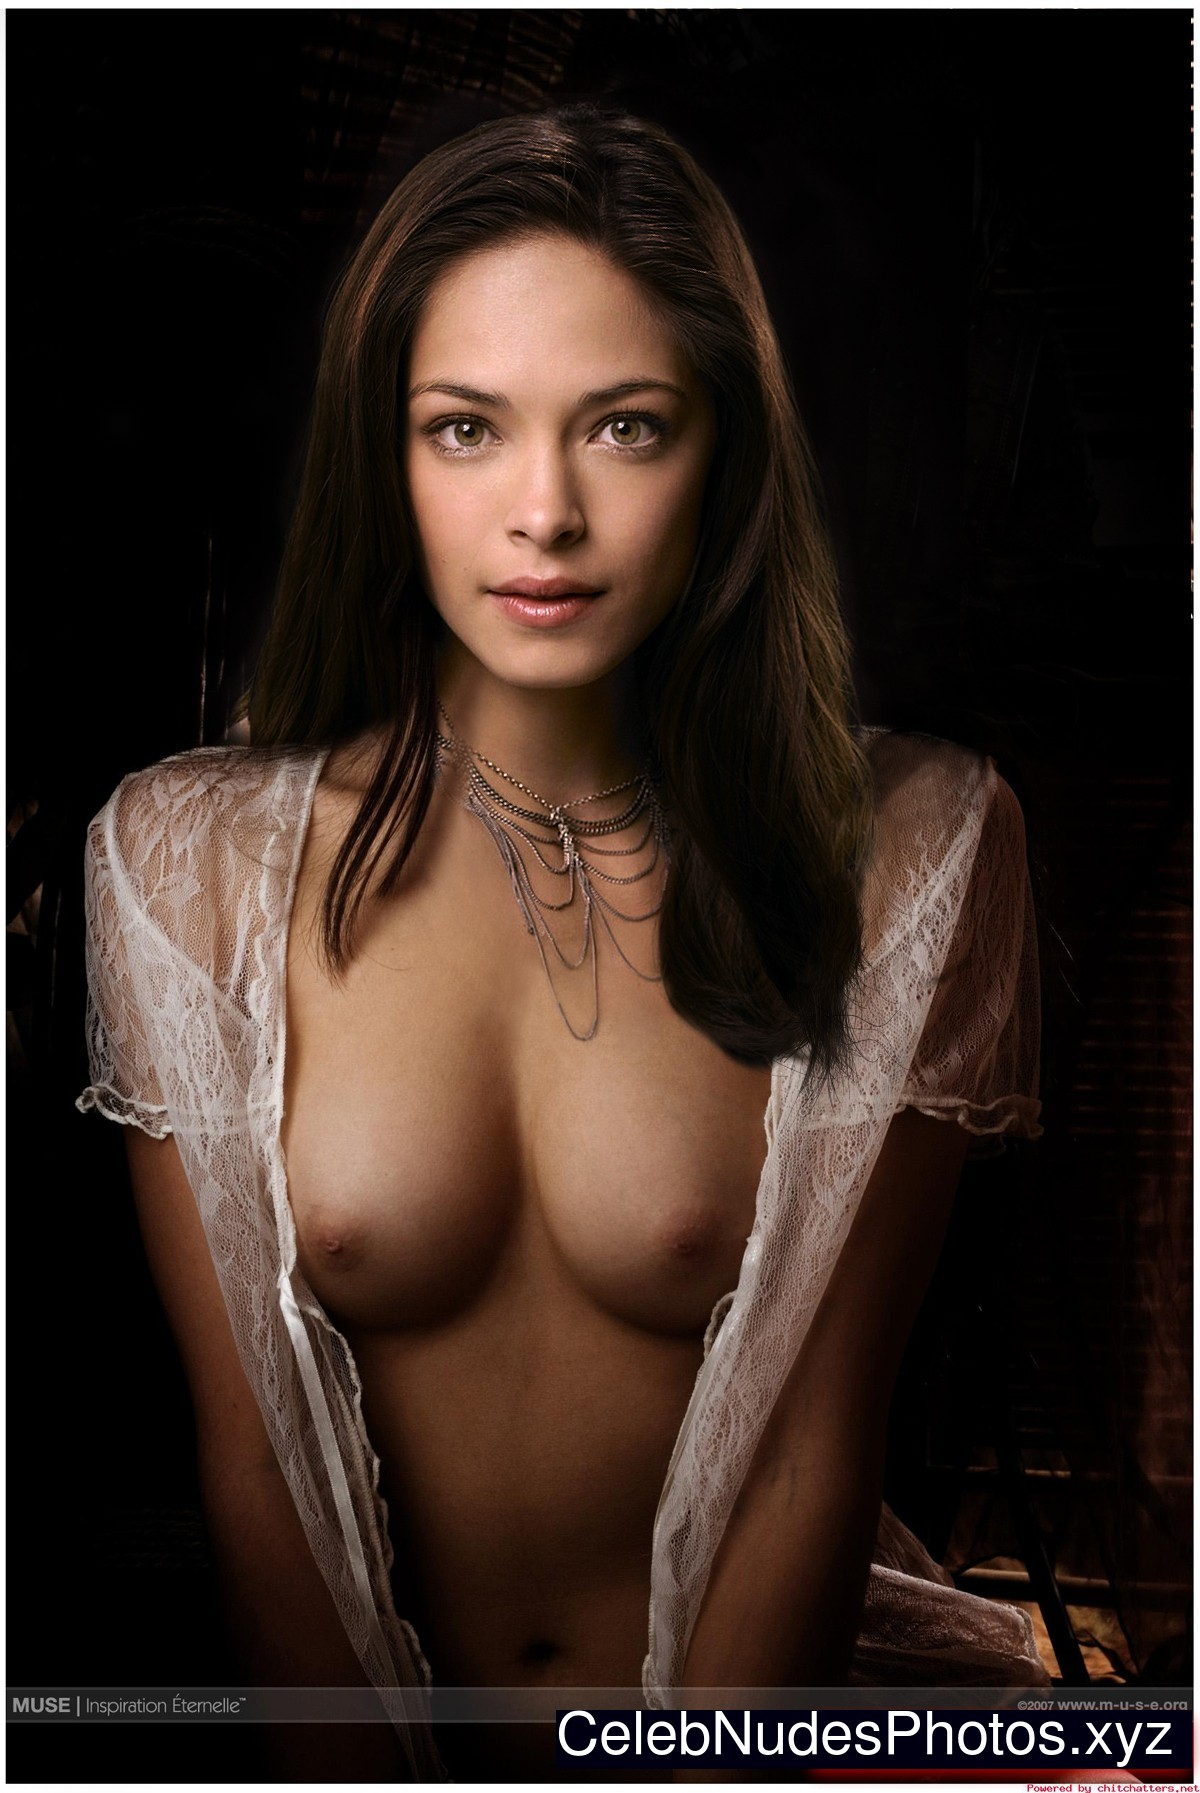 sexy kristin kreuk nude